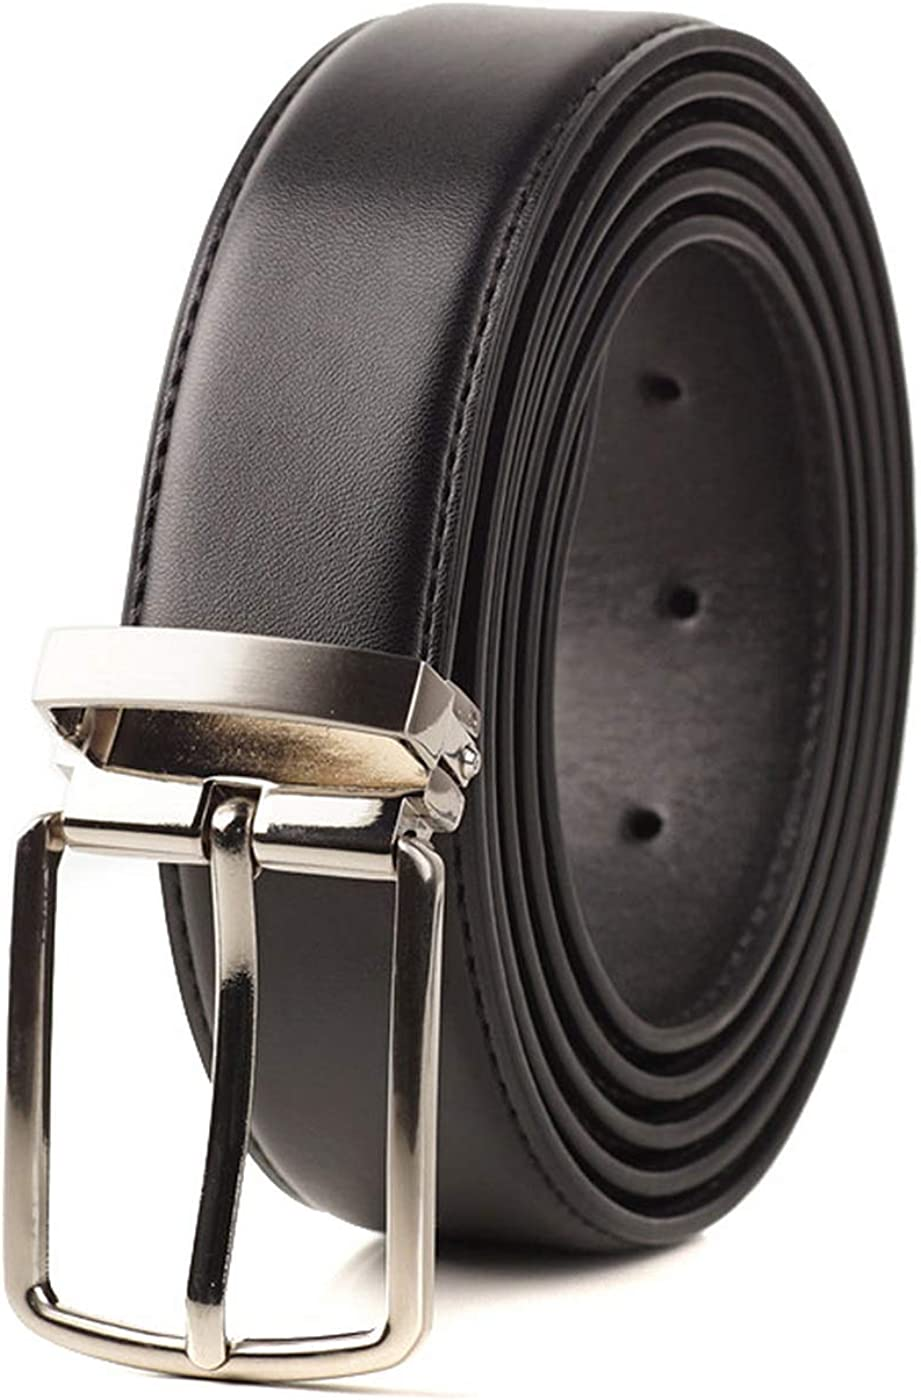 ANYWALK Men's Belts ☆国内最安値に挑戦☆ Big 人気激安 and 80